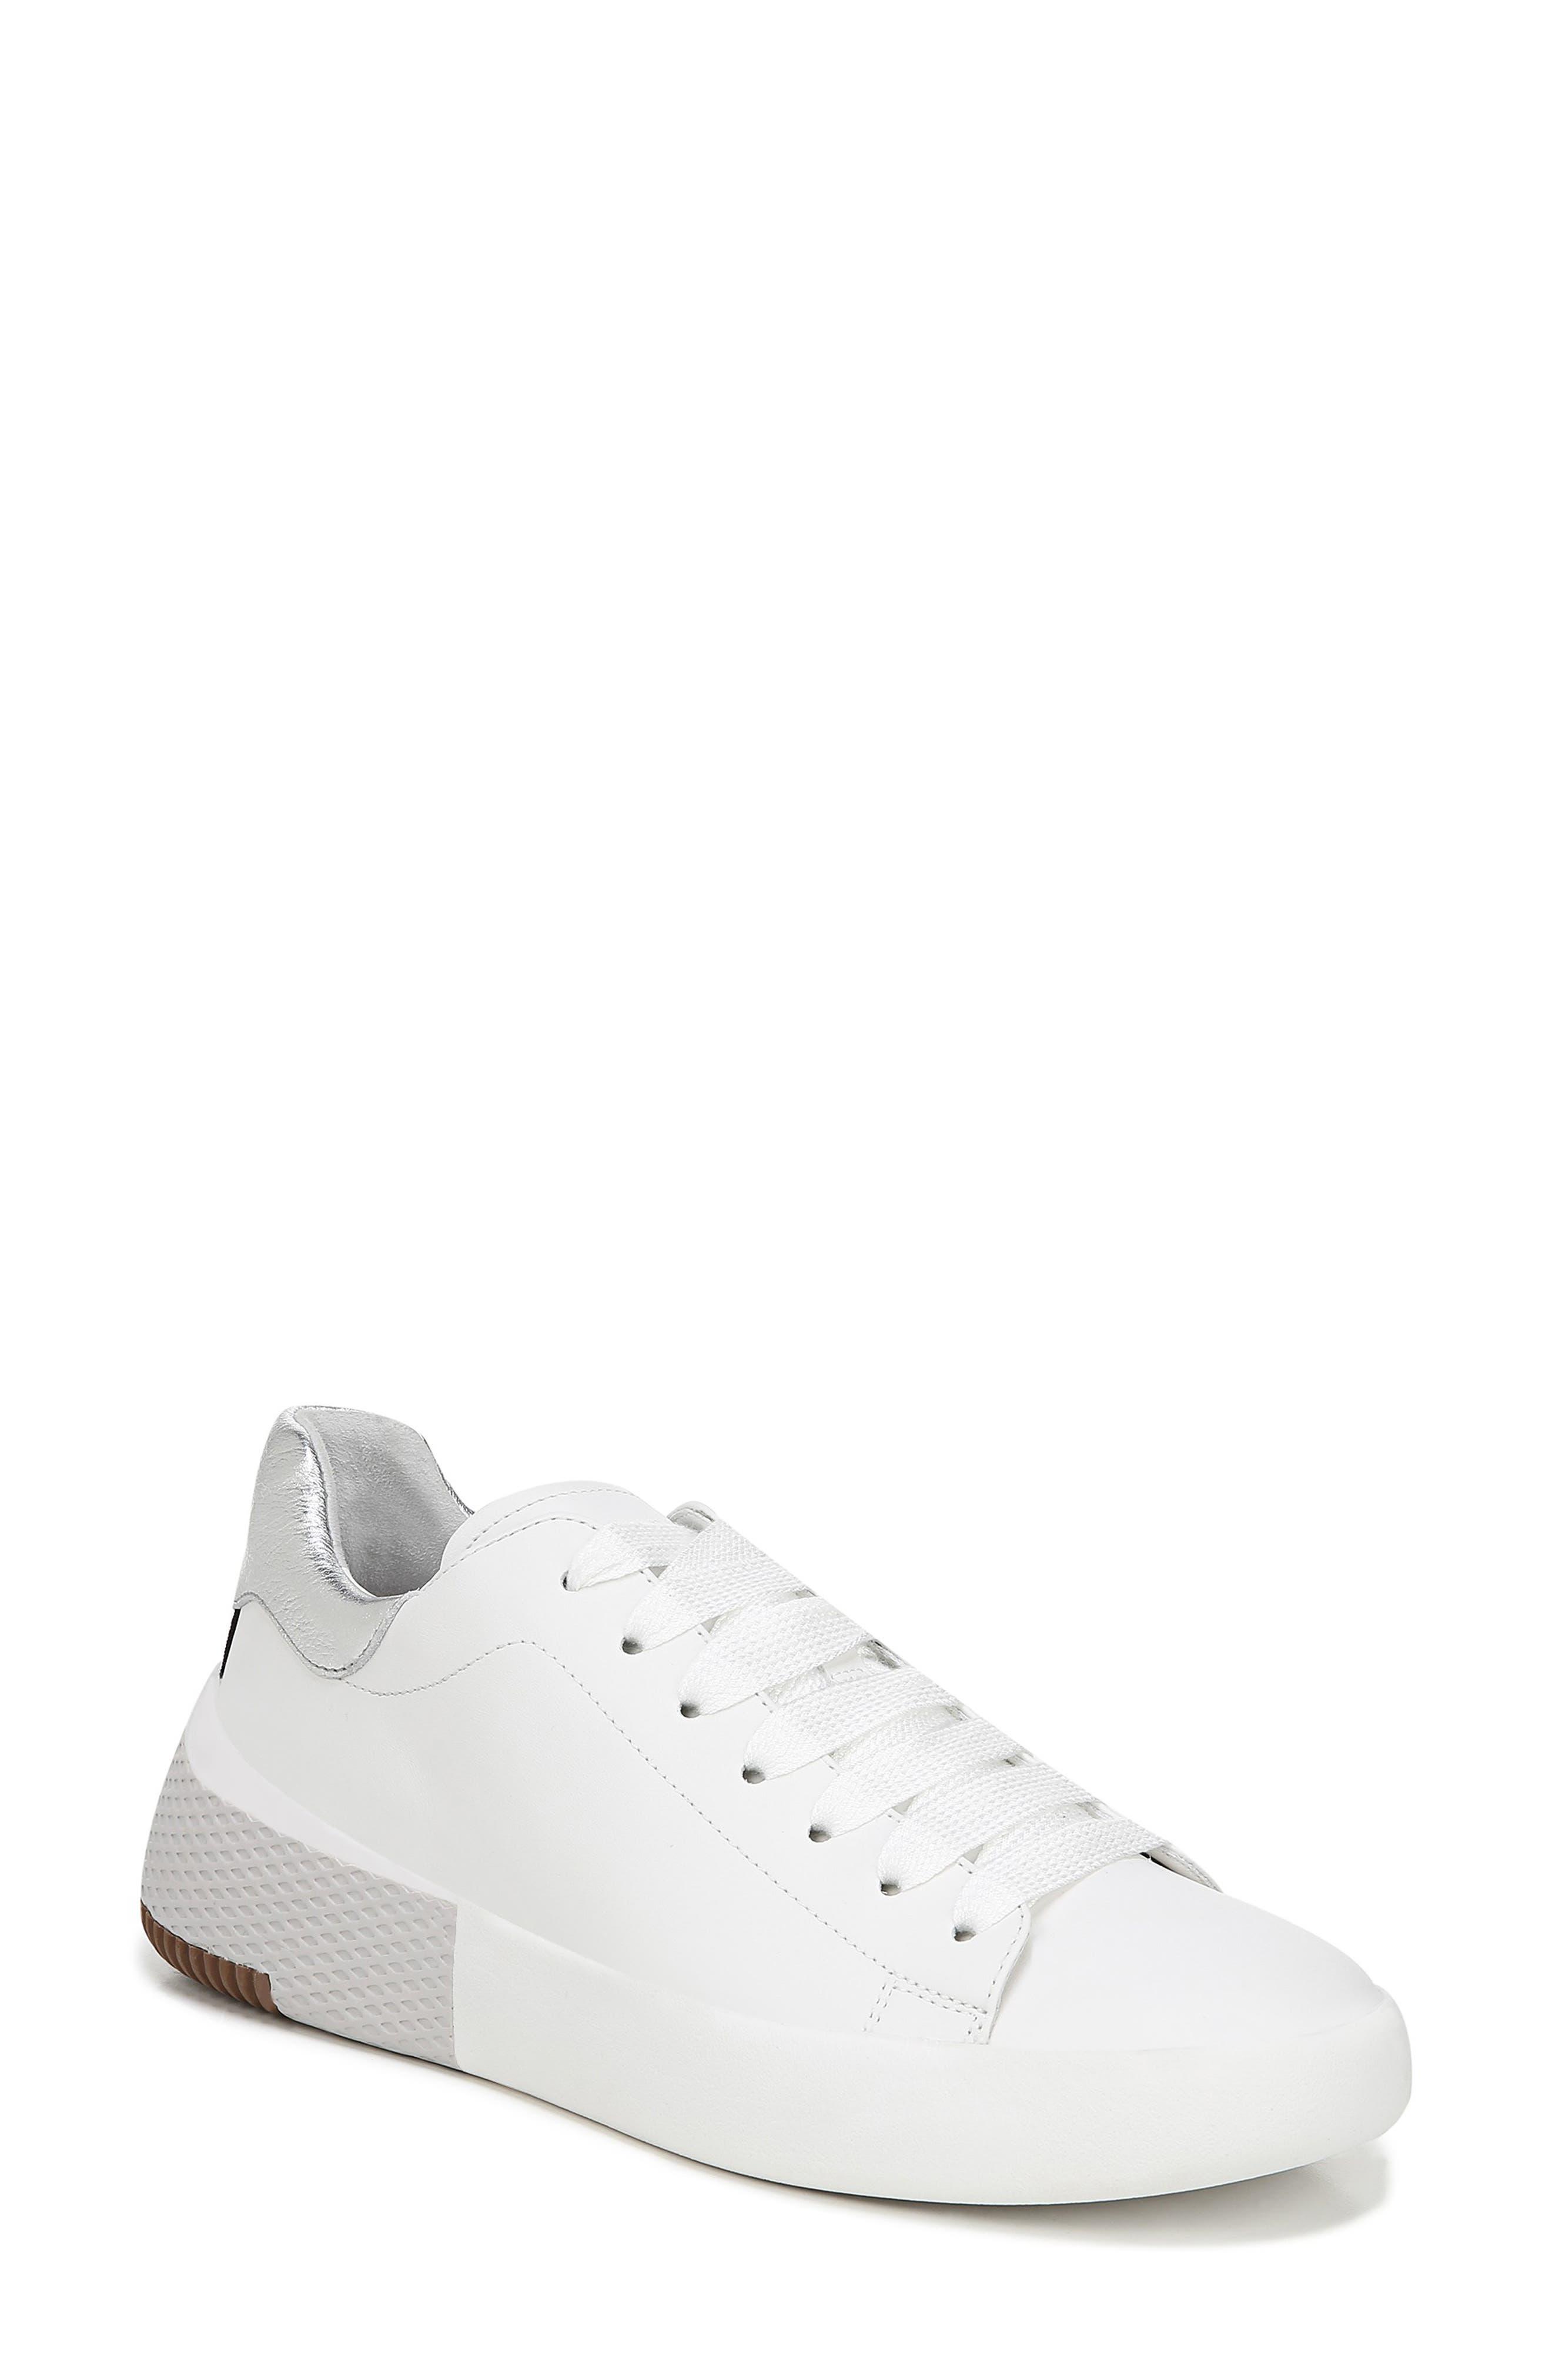 VIA SPIGA, Parrel Sneaker, Main thumbnail 1, color, PORCELAIN/ SILVER